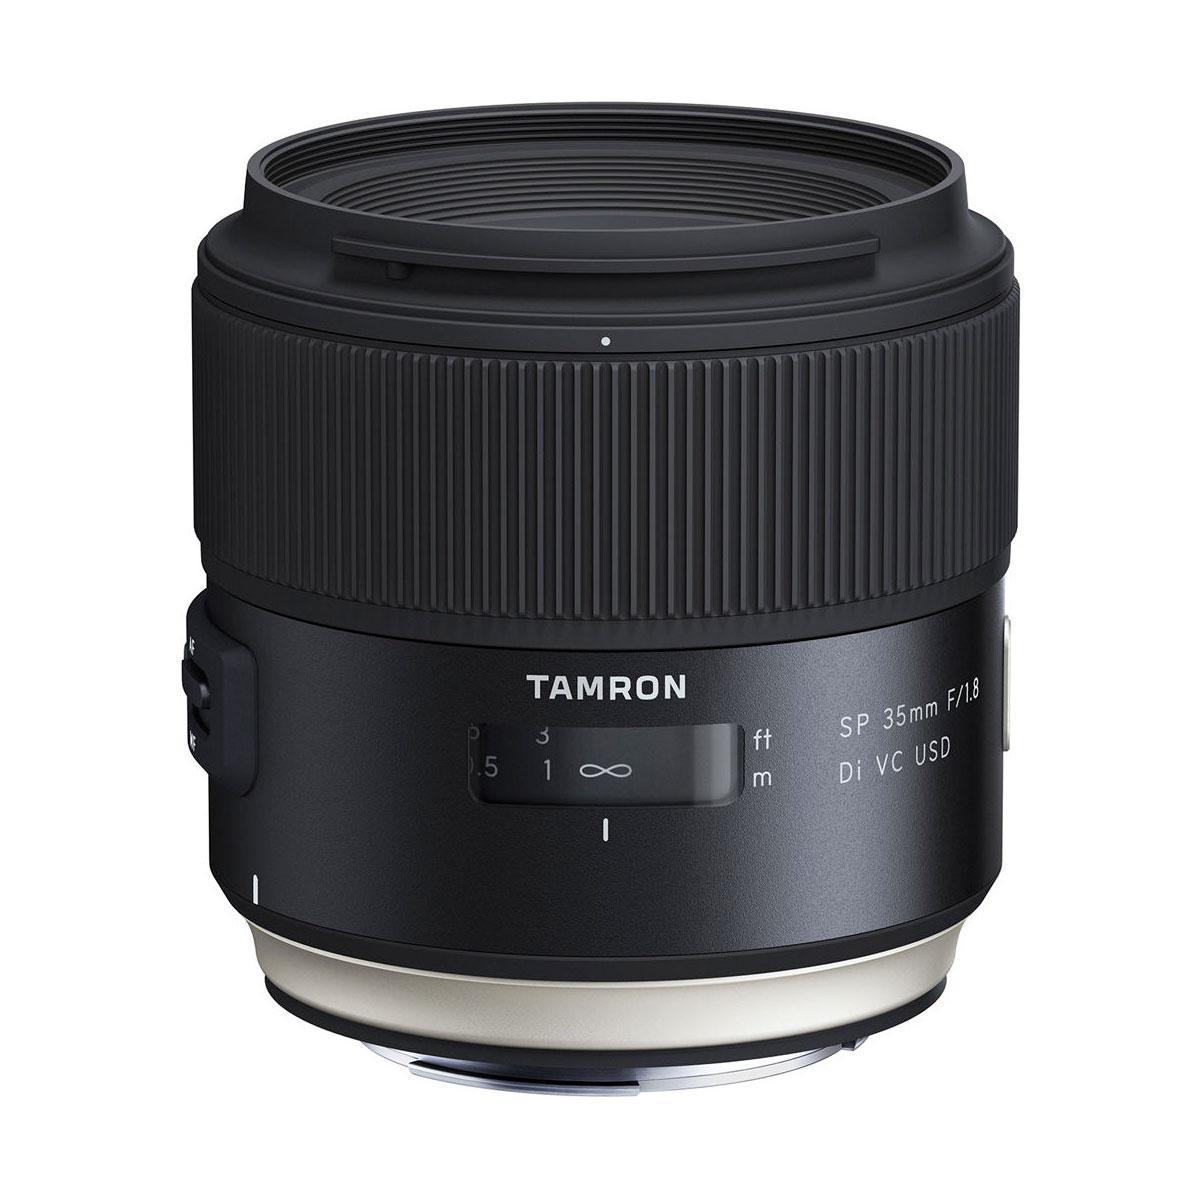 Tamron SP 35mm f/1.8 DI VC USD – Nikon